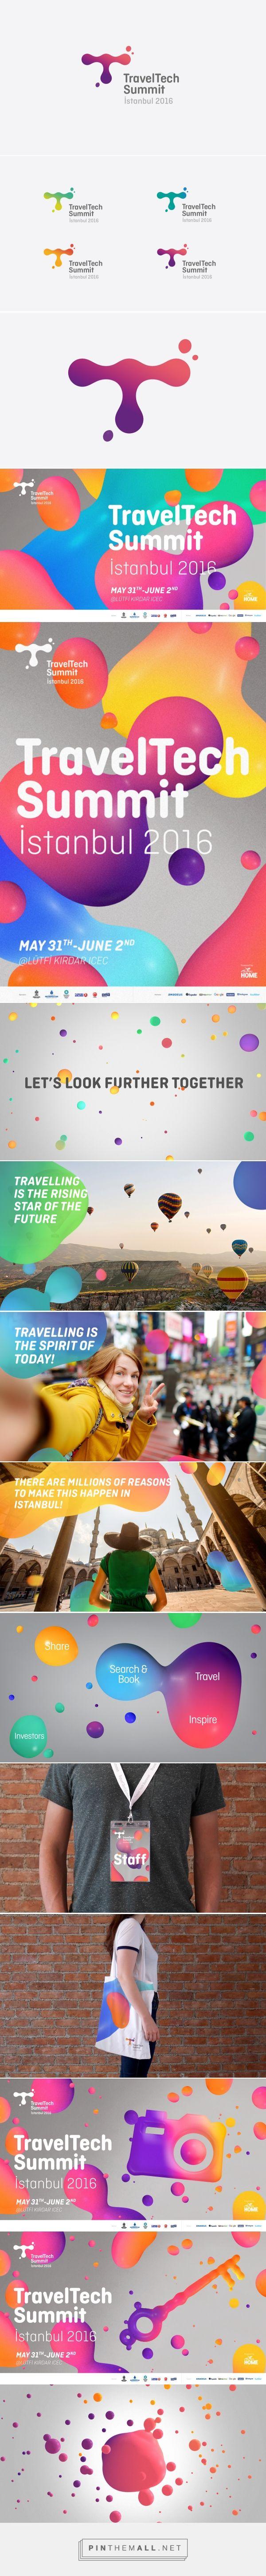 Travel Tech Summit on Behance - created via https://pinthemall.net